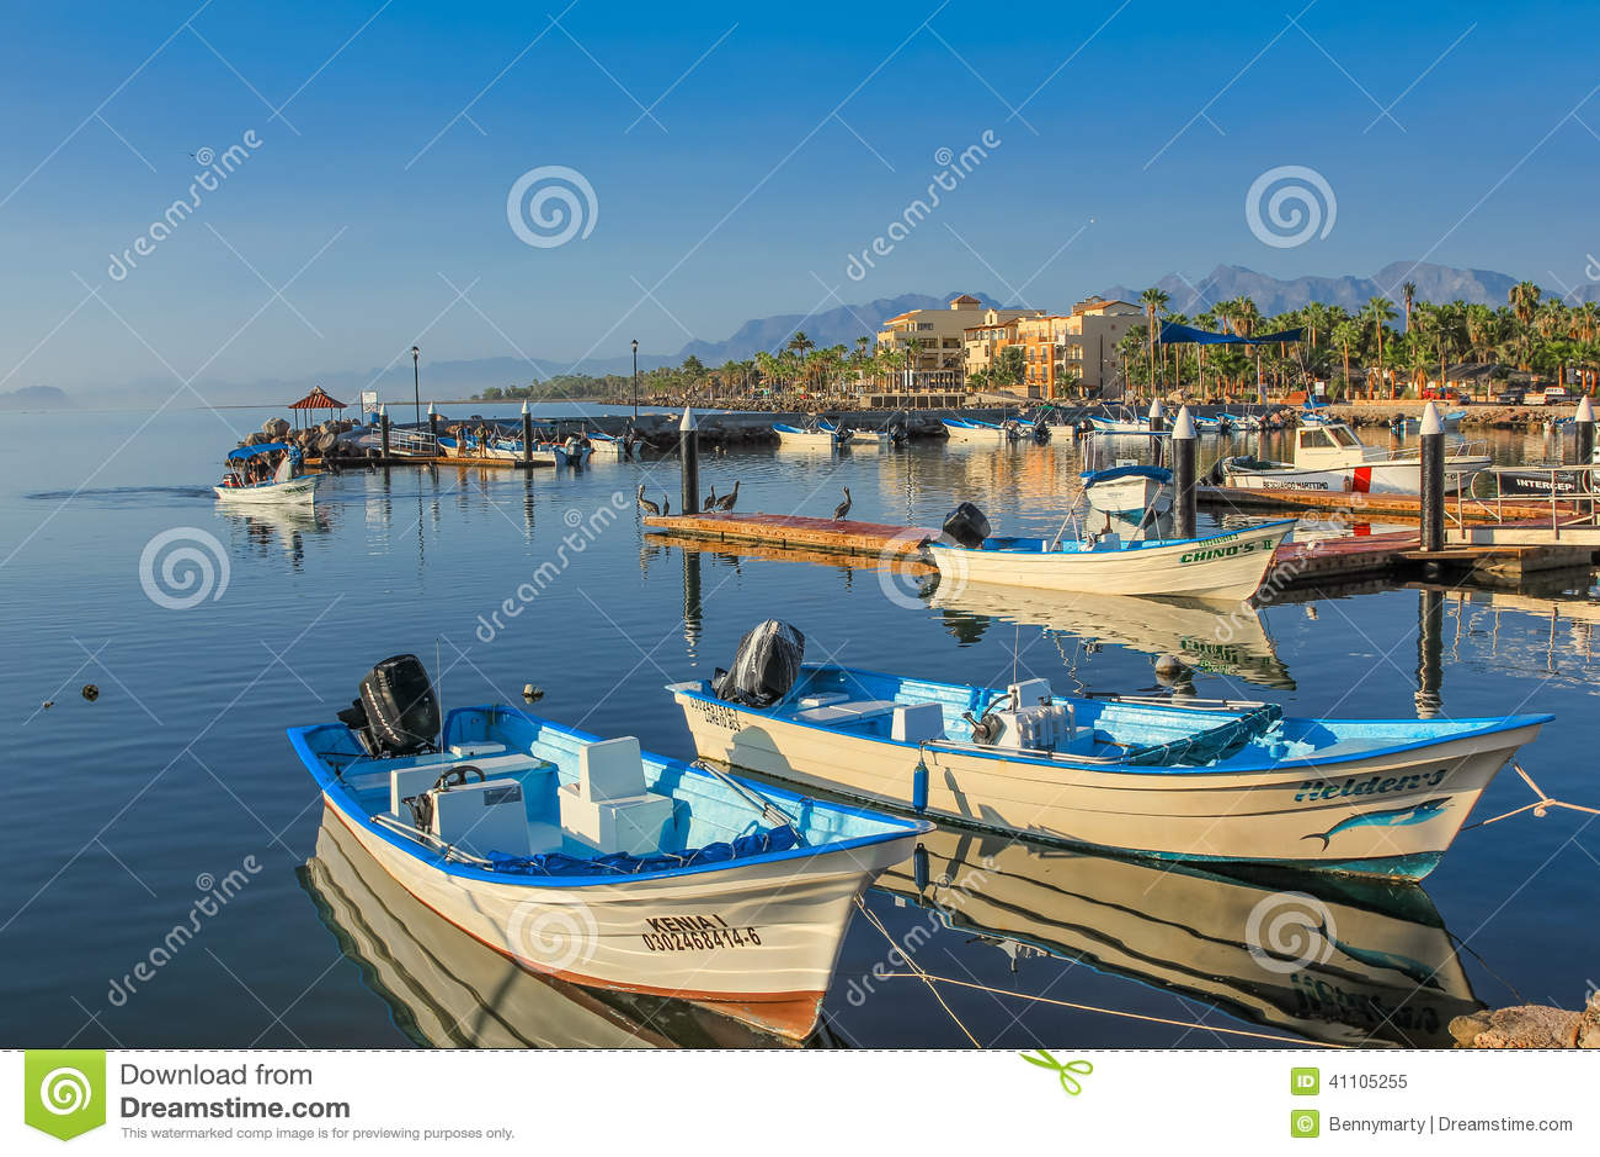 Port of loreto editorial image image 41105255 for Baja california fishing